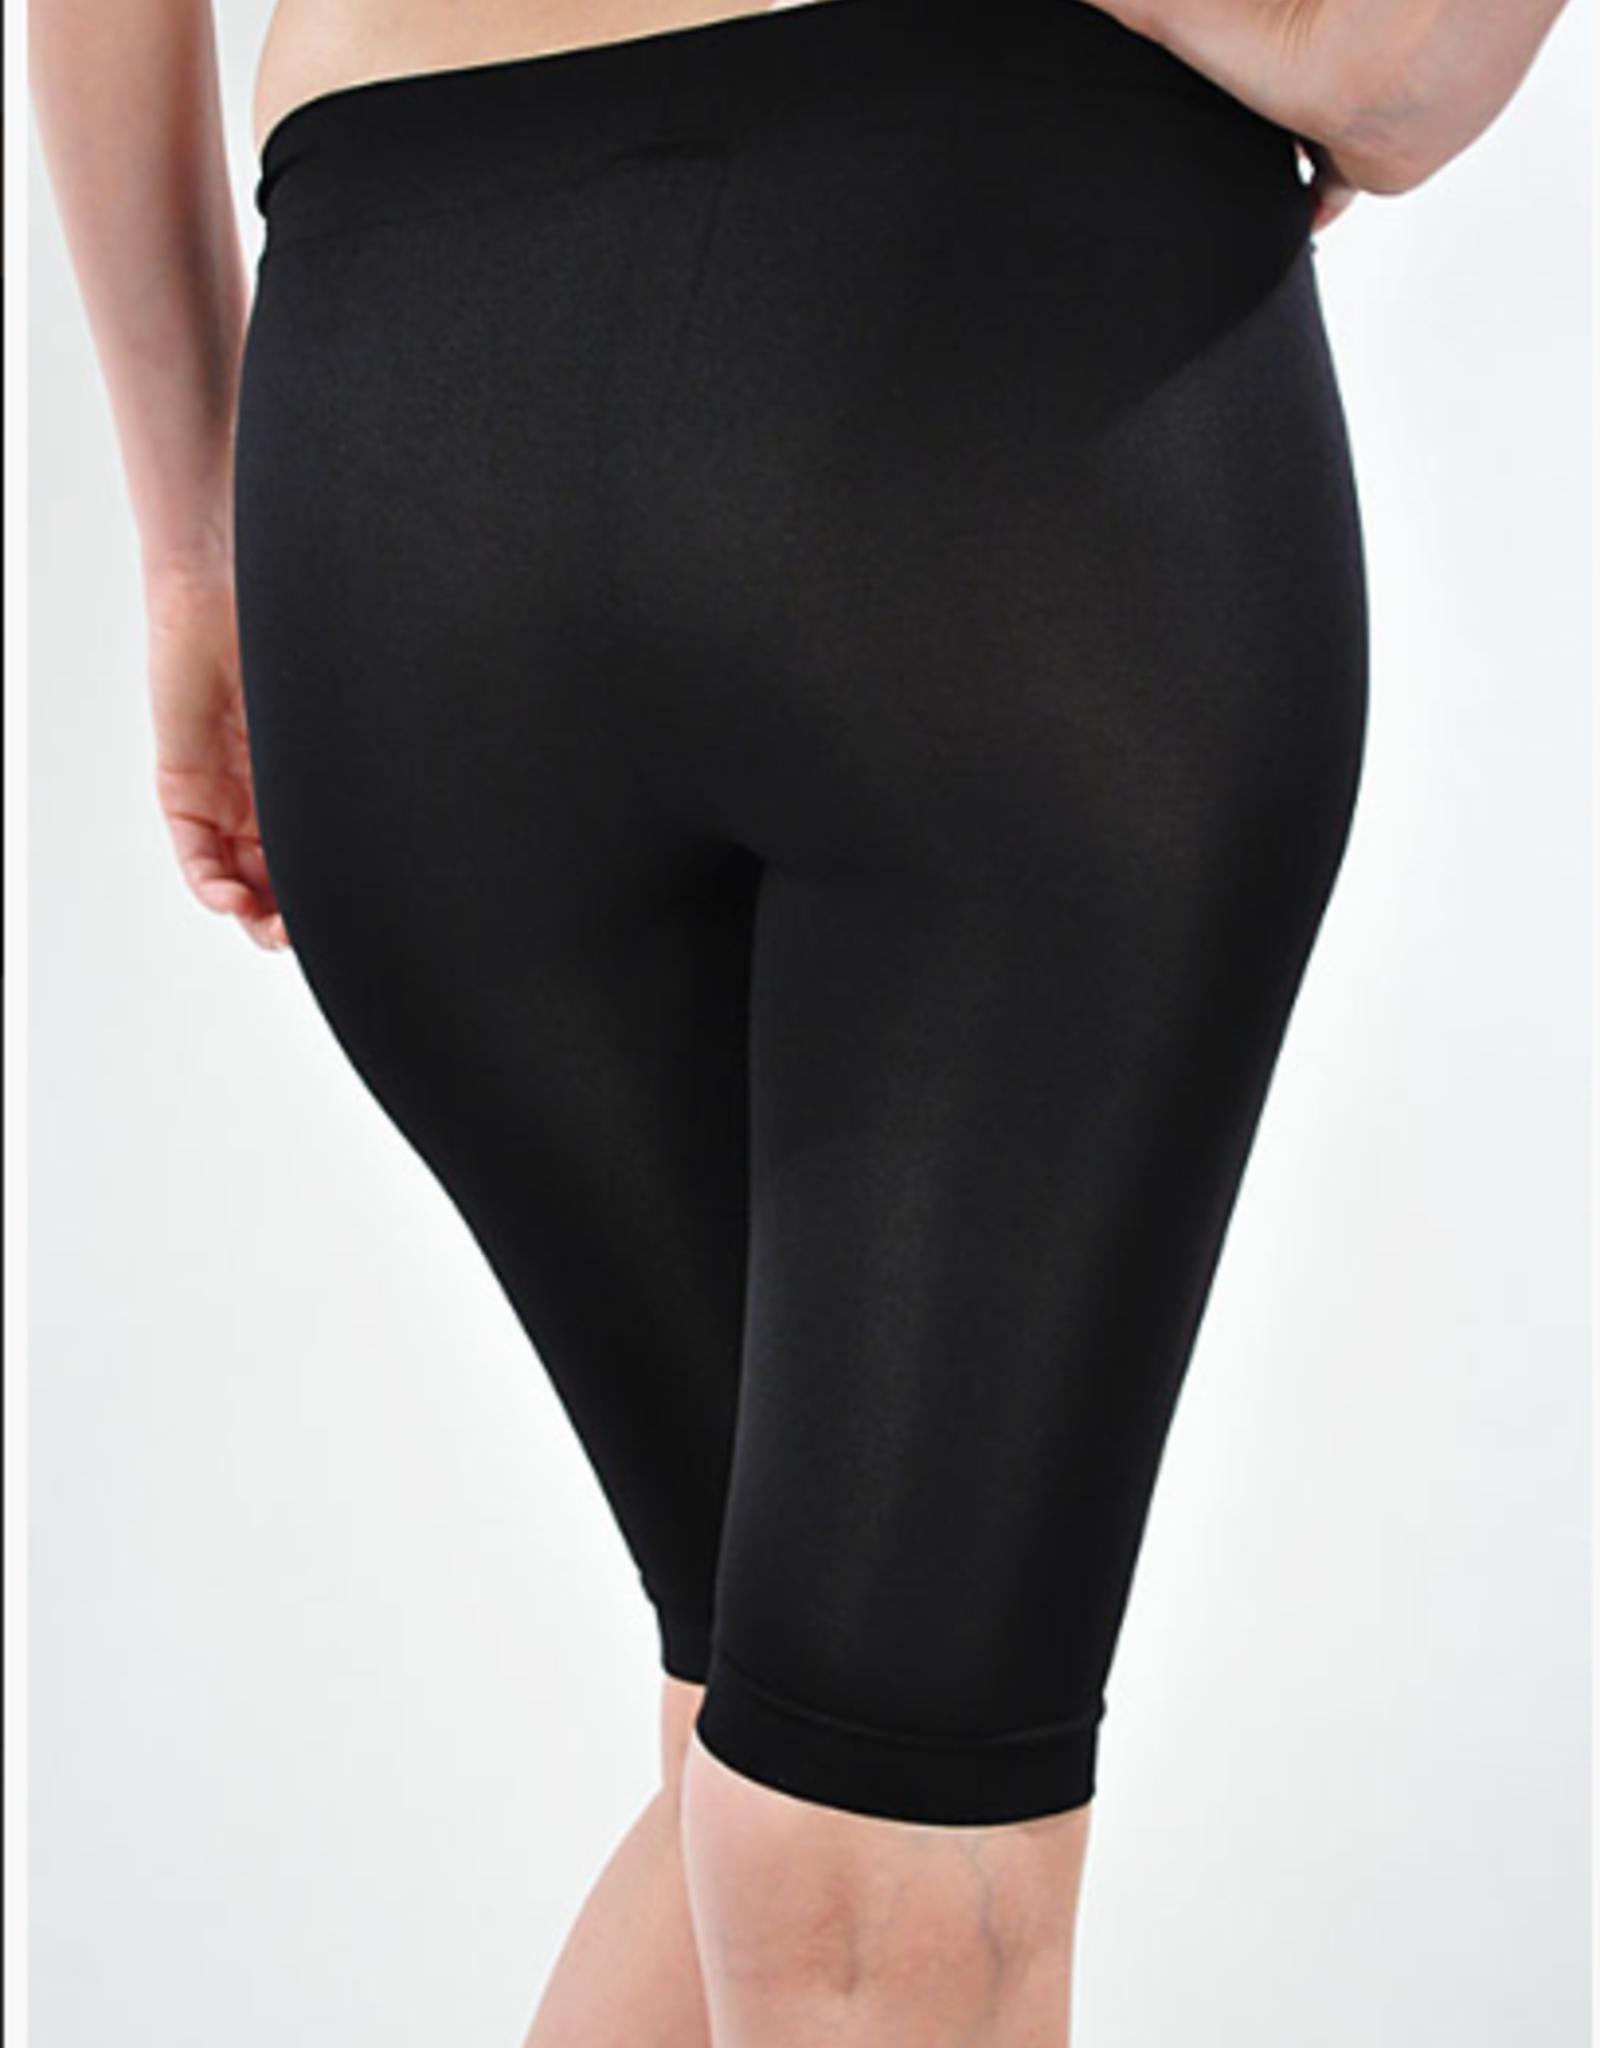 bermuda biking shorts long black